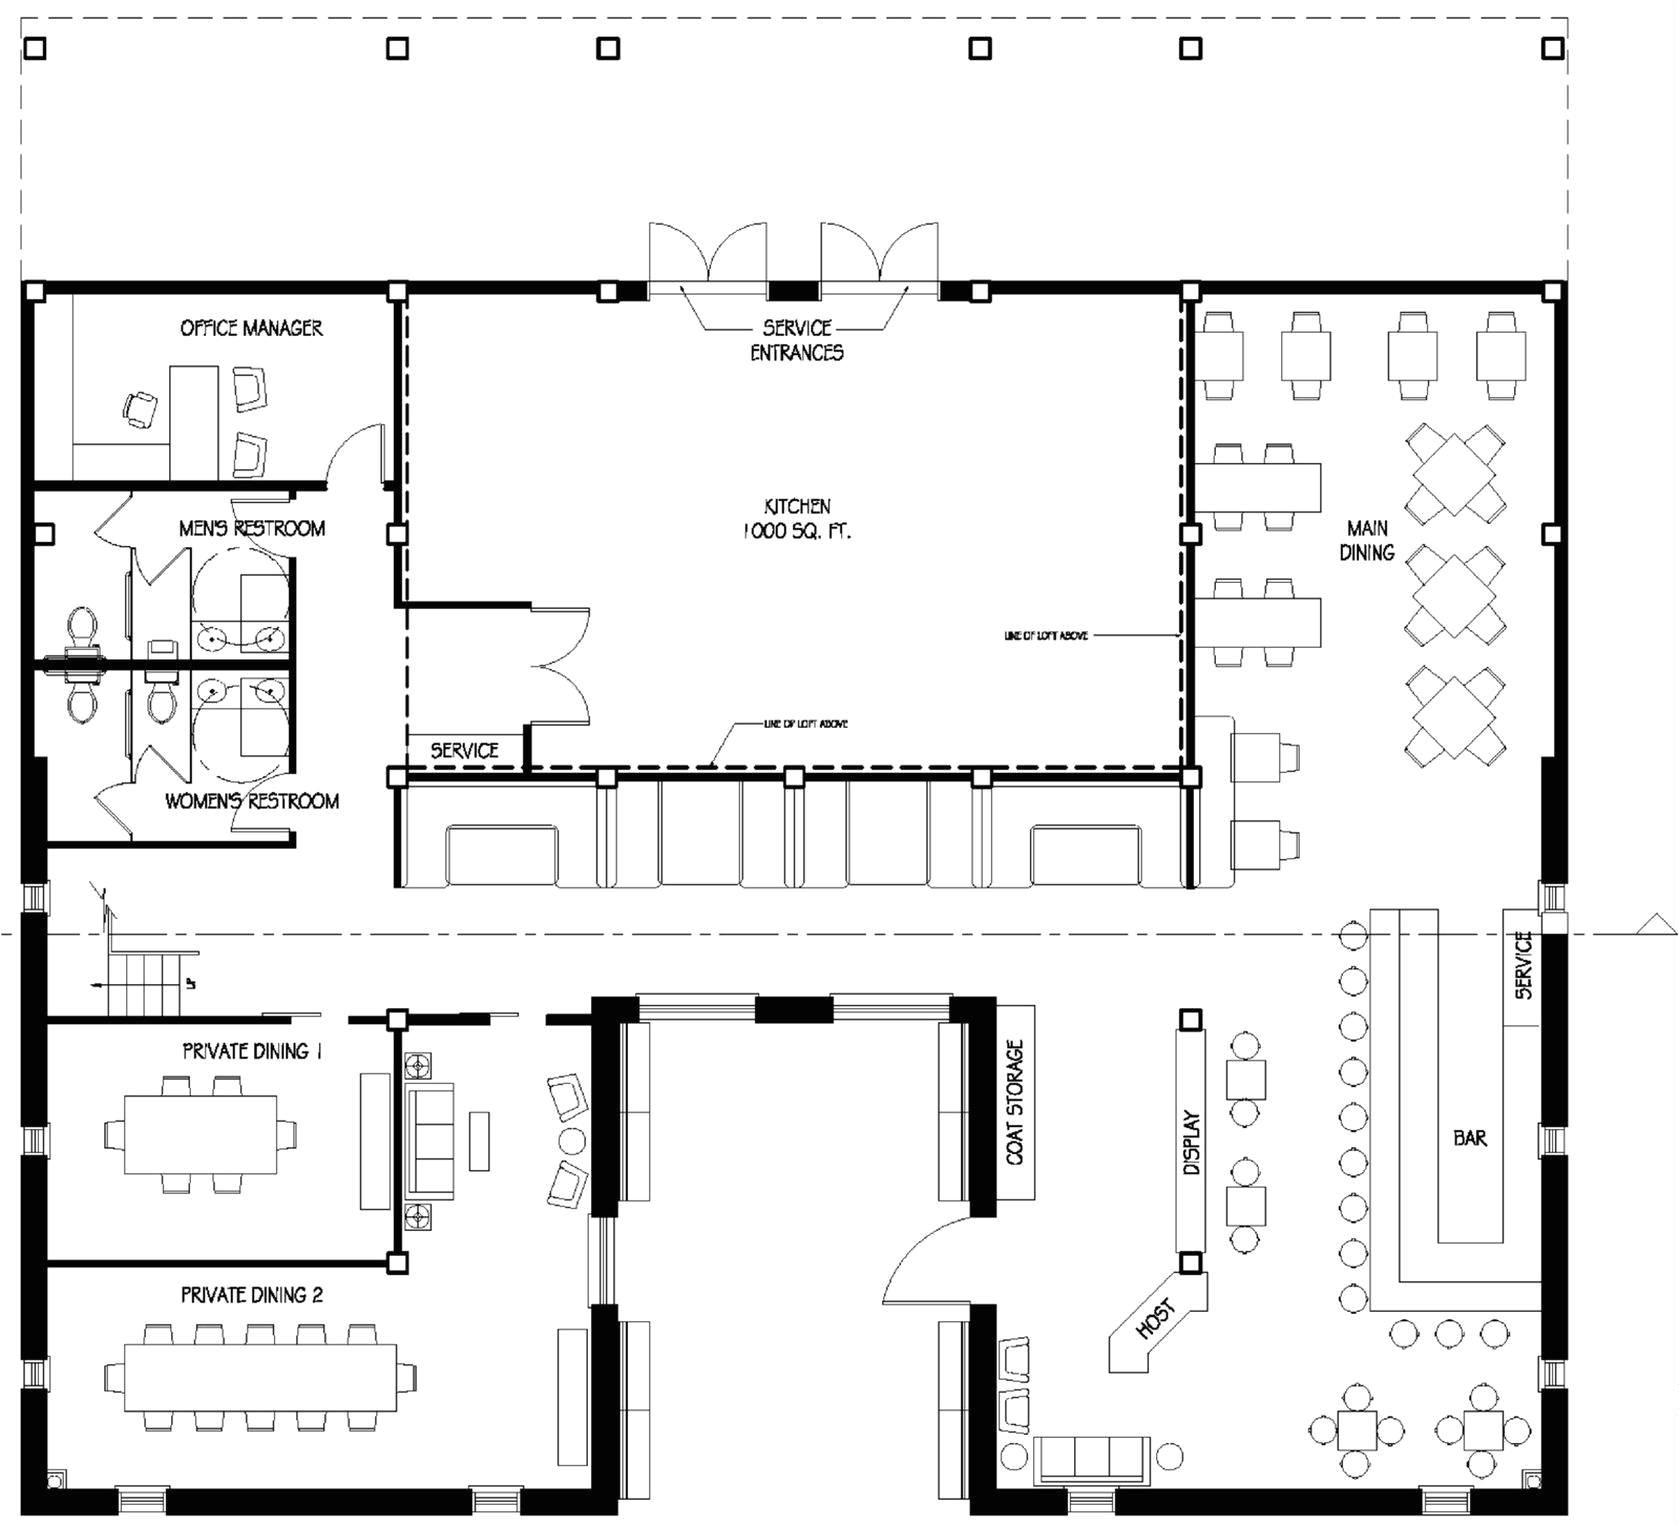 homes of merit floor plans cheap floor plans for homes inspirational home plans free plans for